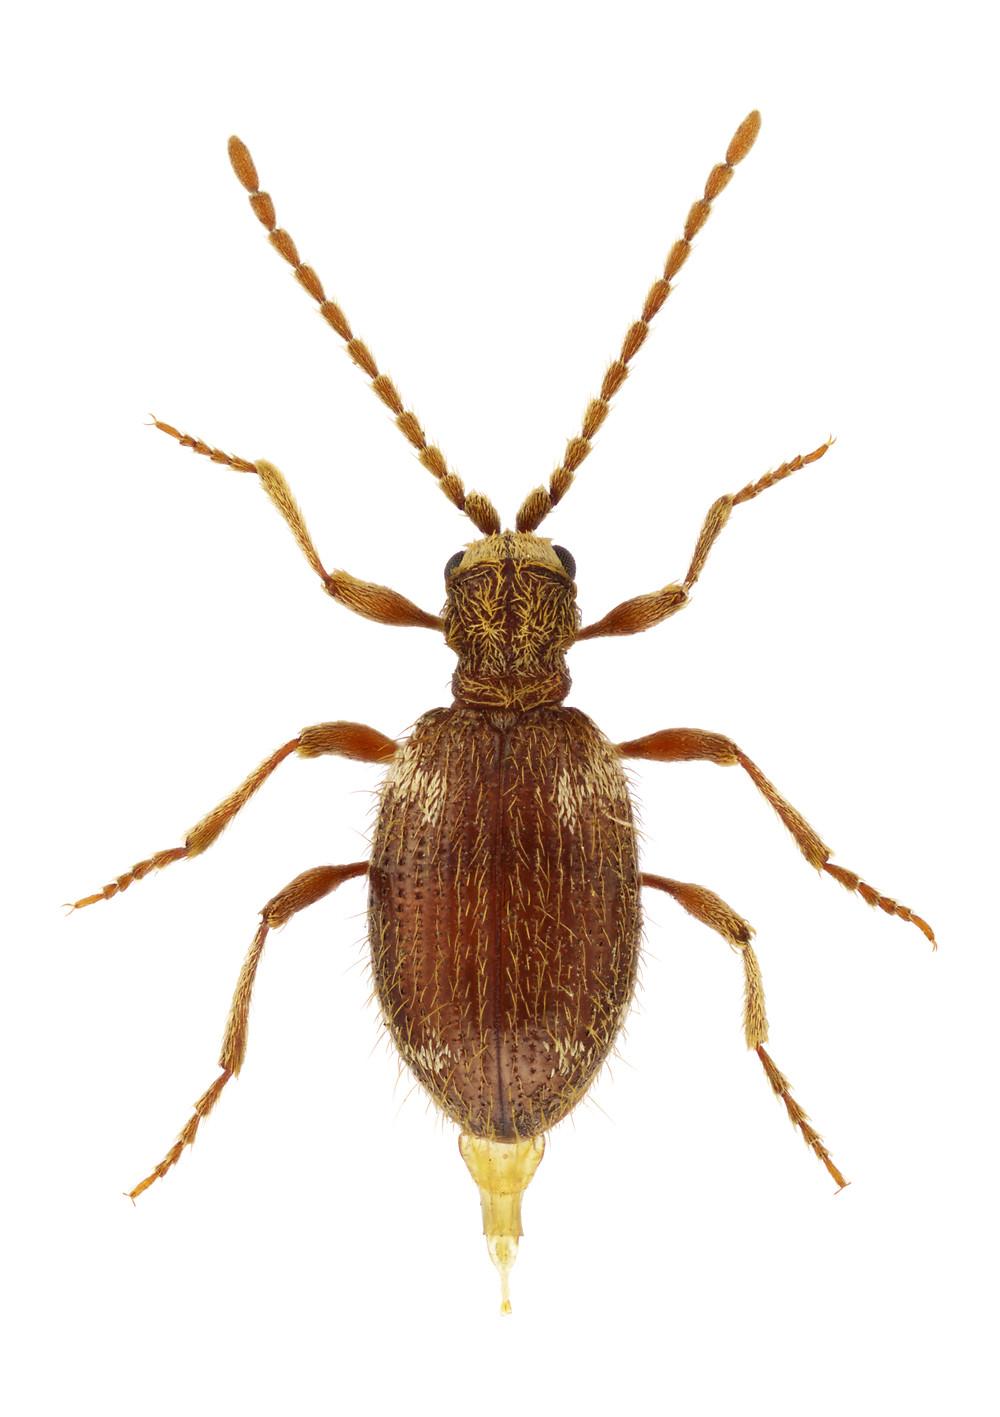 Female of Ptinus villiger, spider beetle